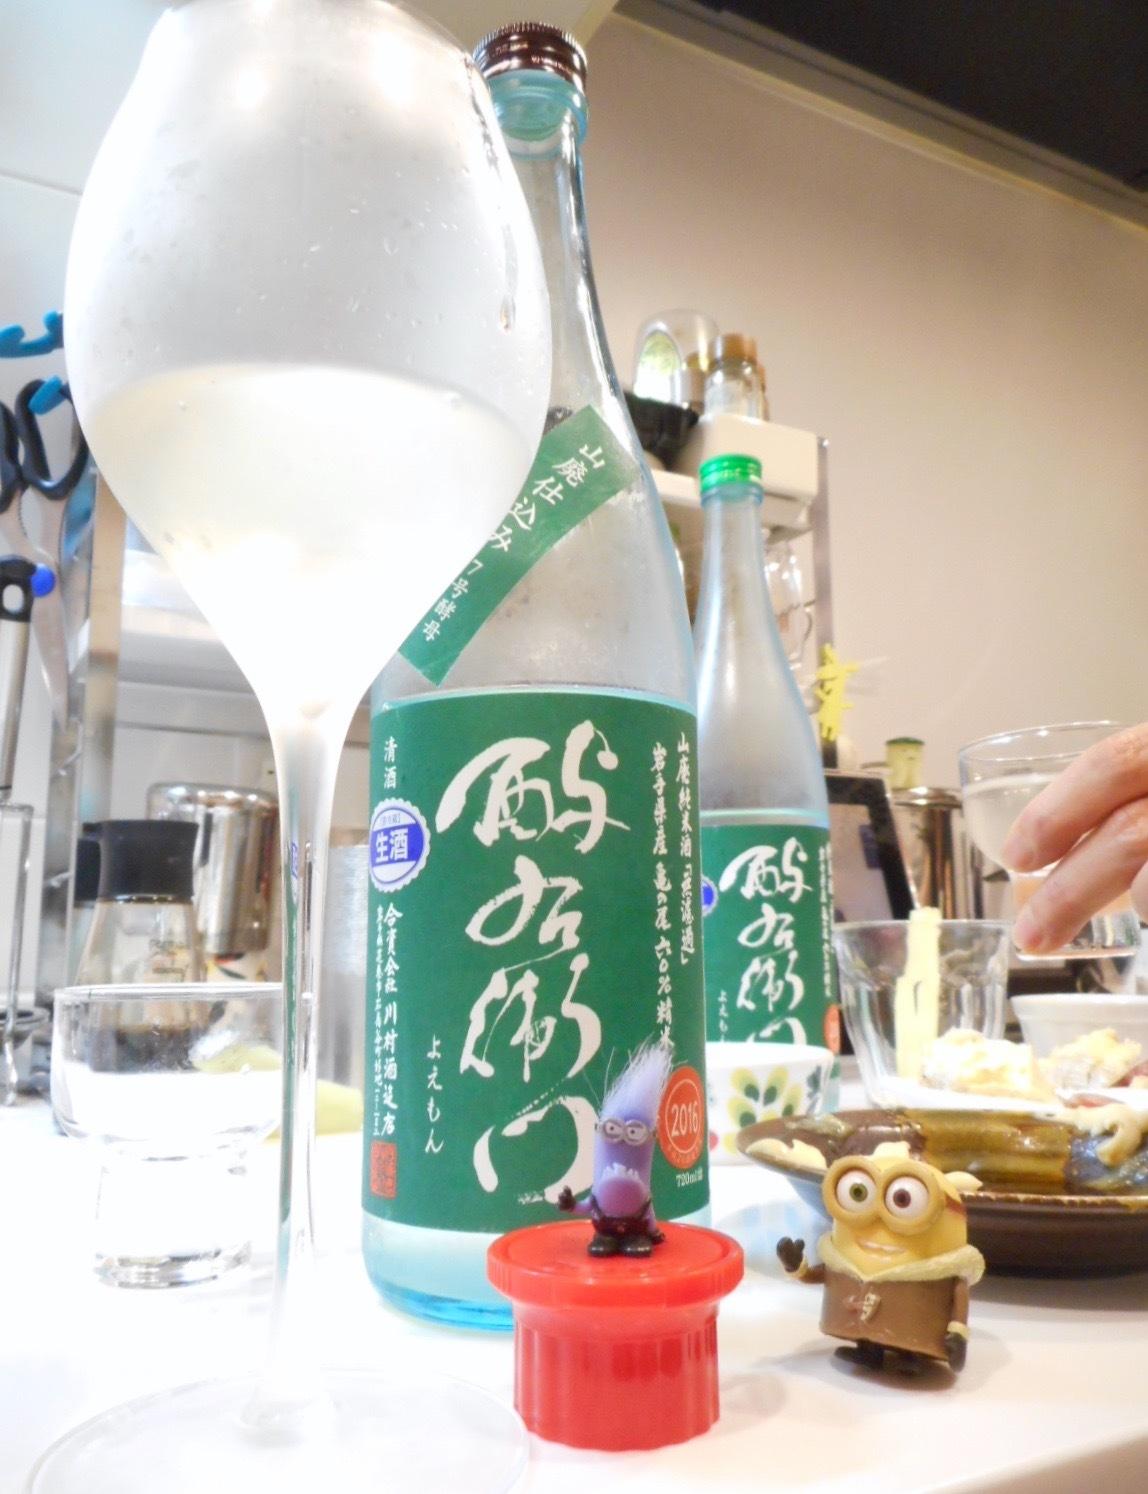 yoemon_kamenoo_yamahai28by5.jpg